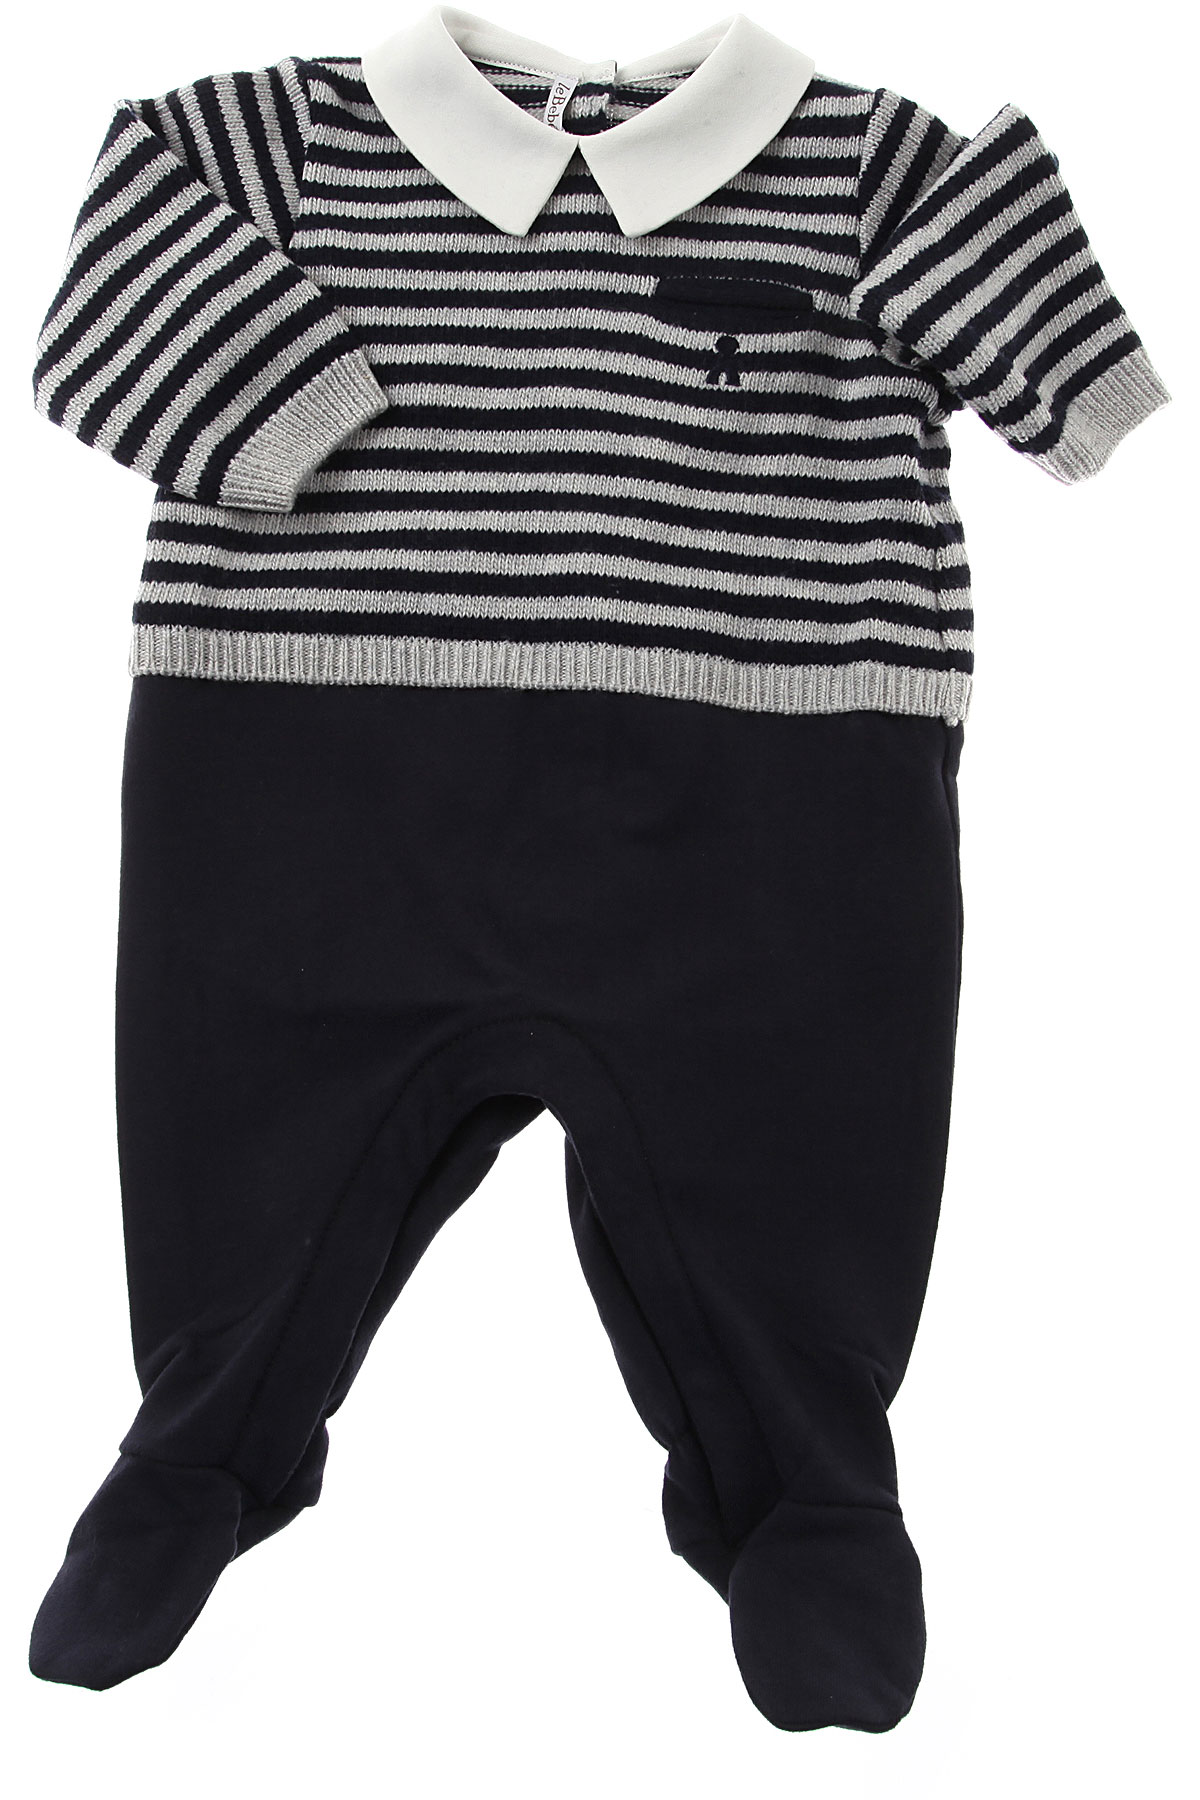 Image of Le Bebe Baby Bodysuits & Onesies for Boys, Blue, Wool, 2017, 3M 6M